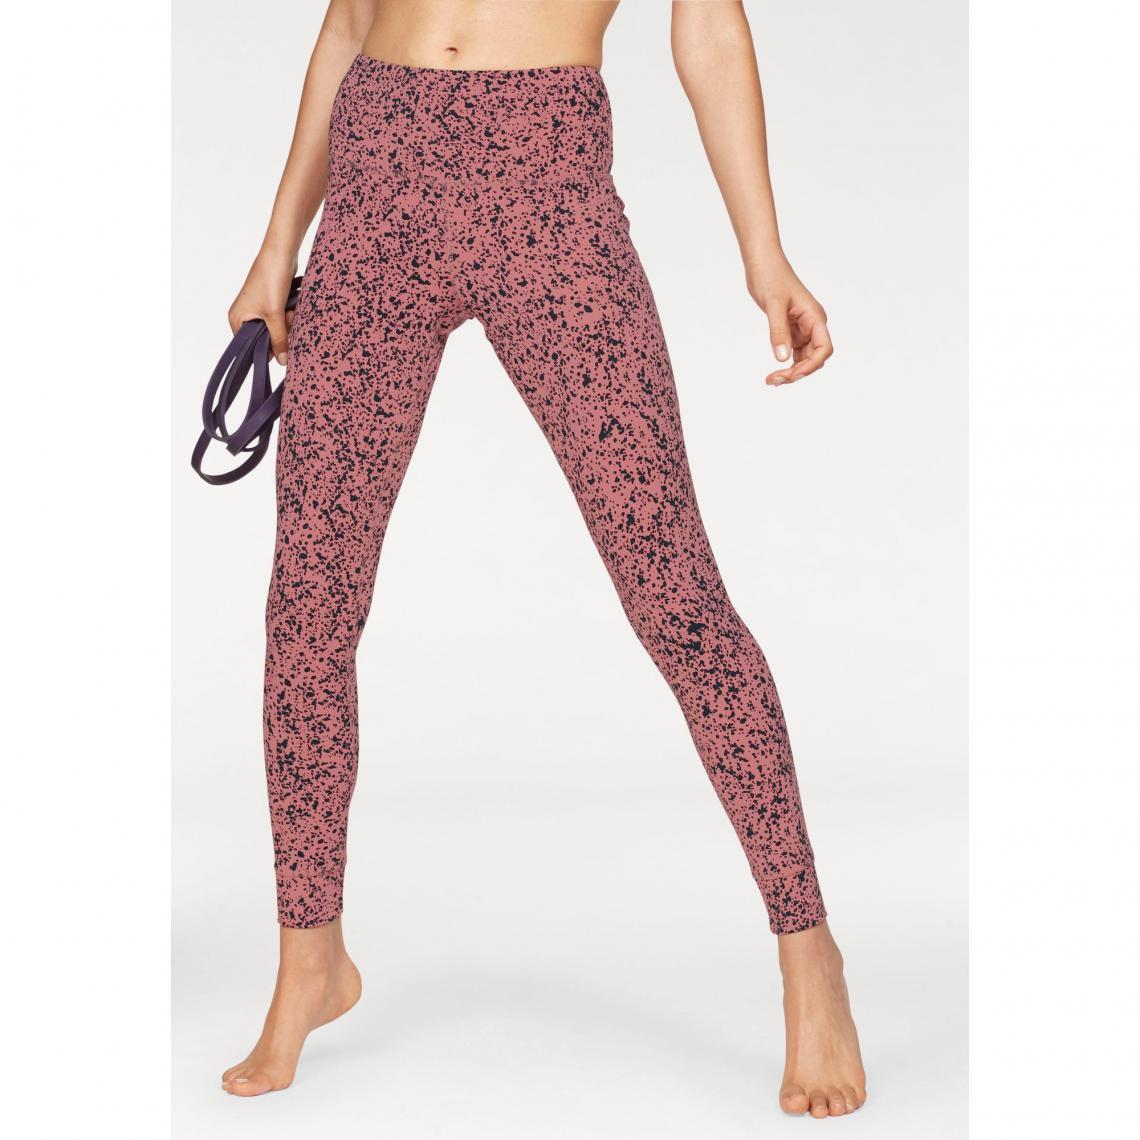 Legging Femme Yoga Speedwick Reebok Rose Noir 3 Suisses